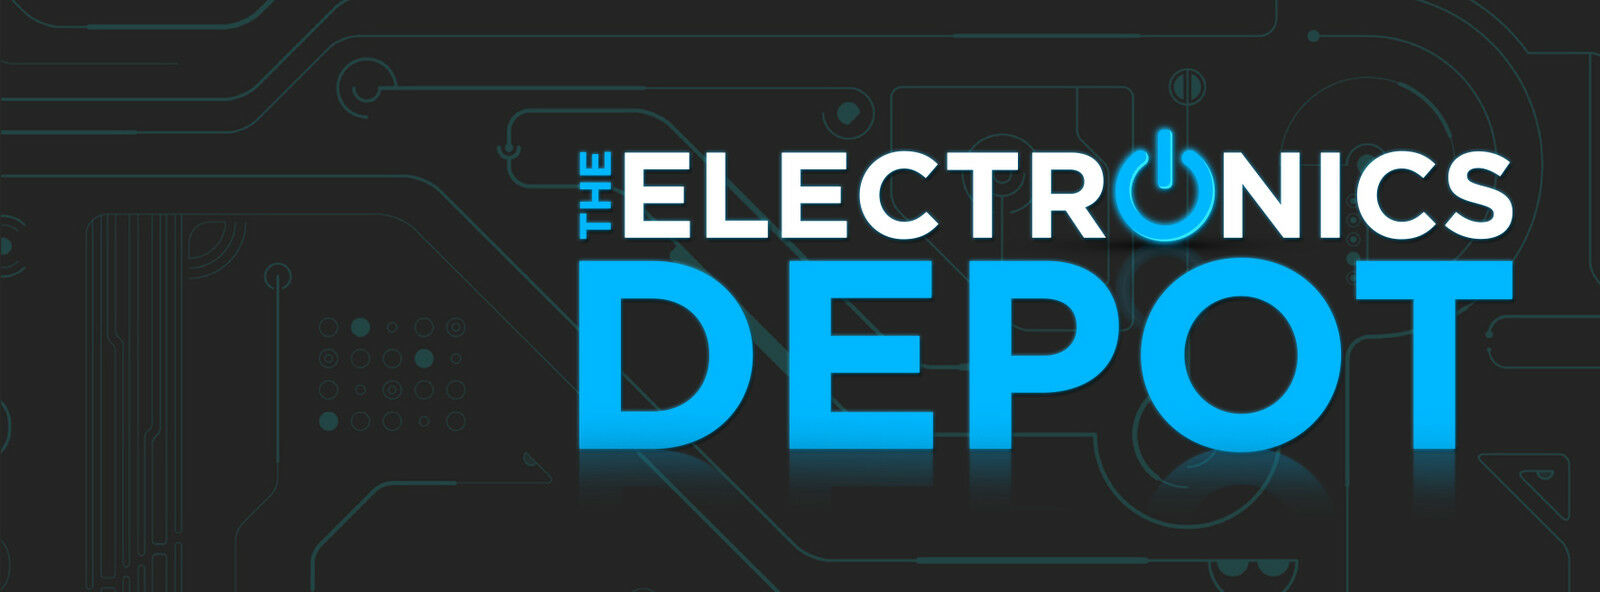 Shop Electronics Depot